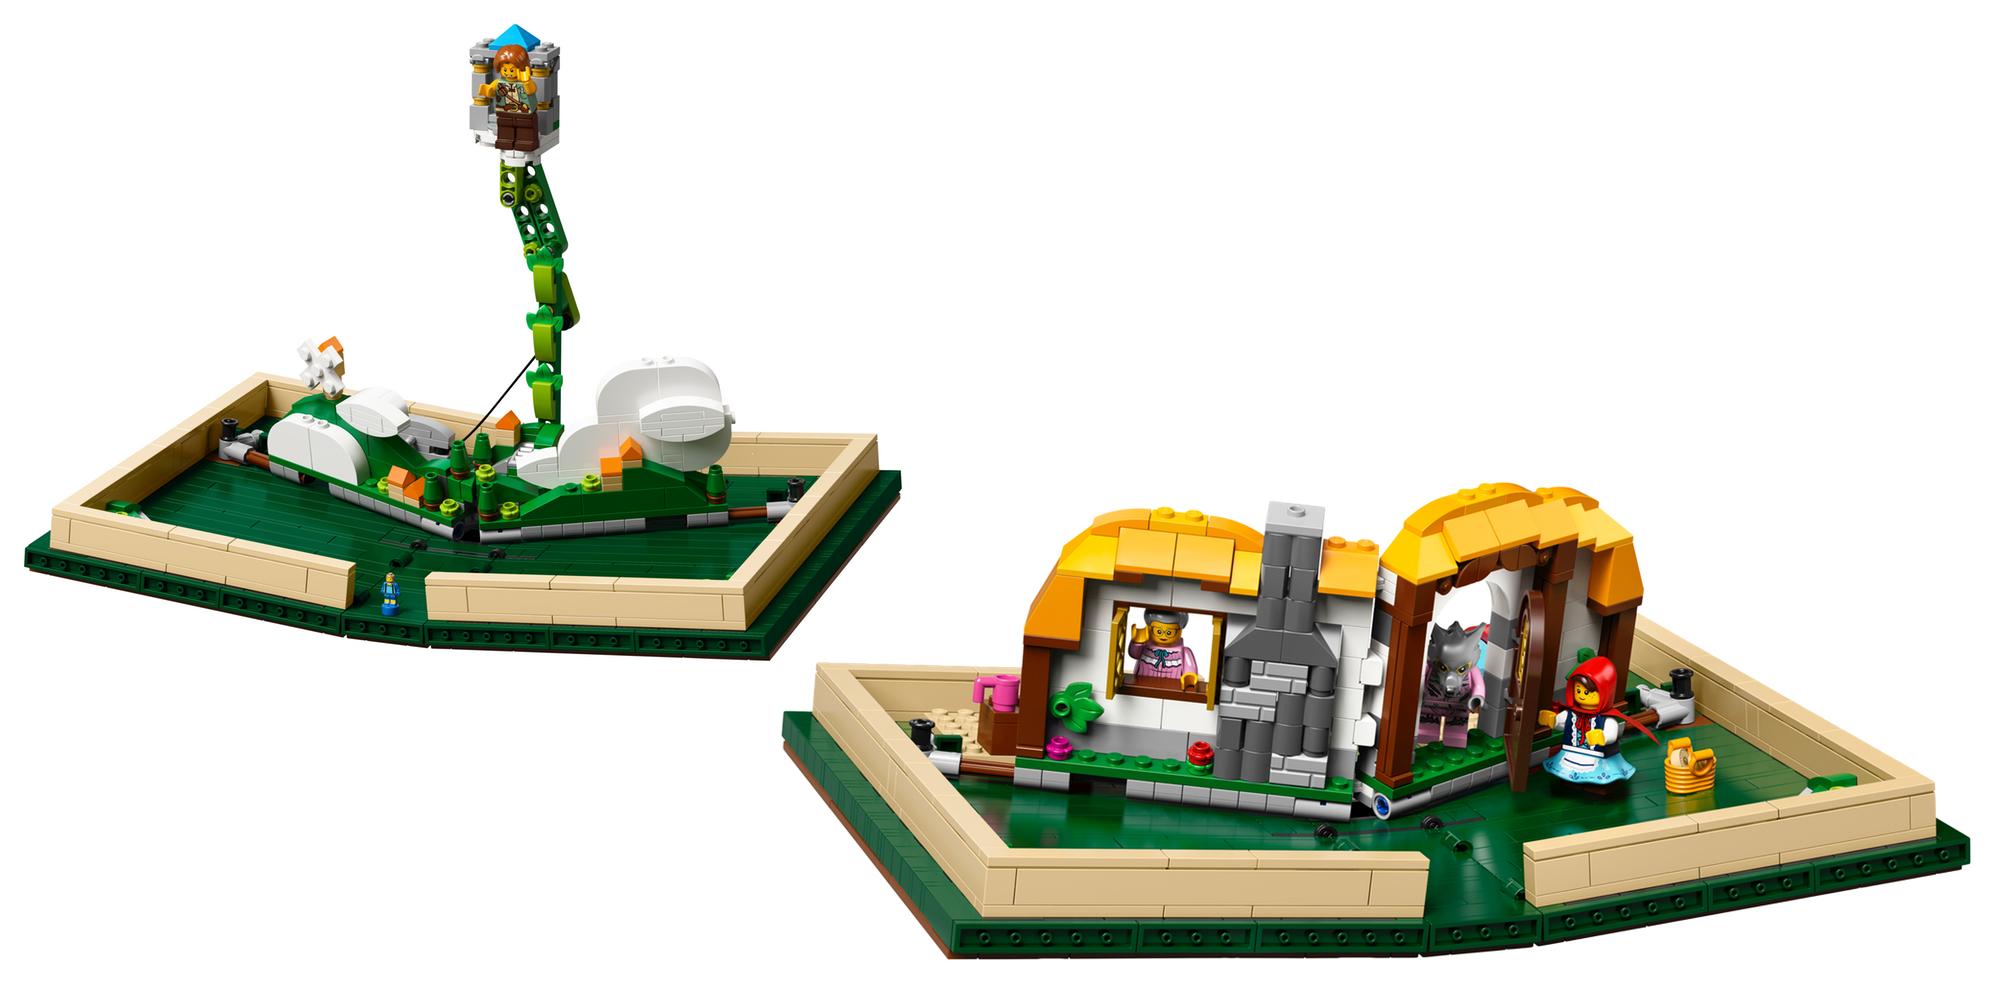 LEGO Pop-Up Book Vignettes